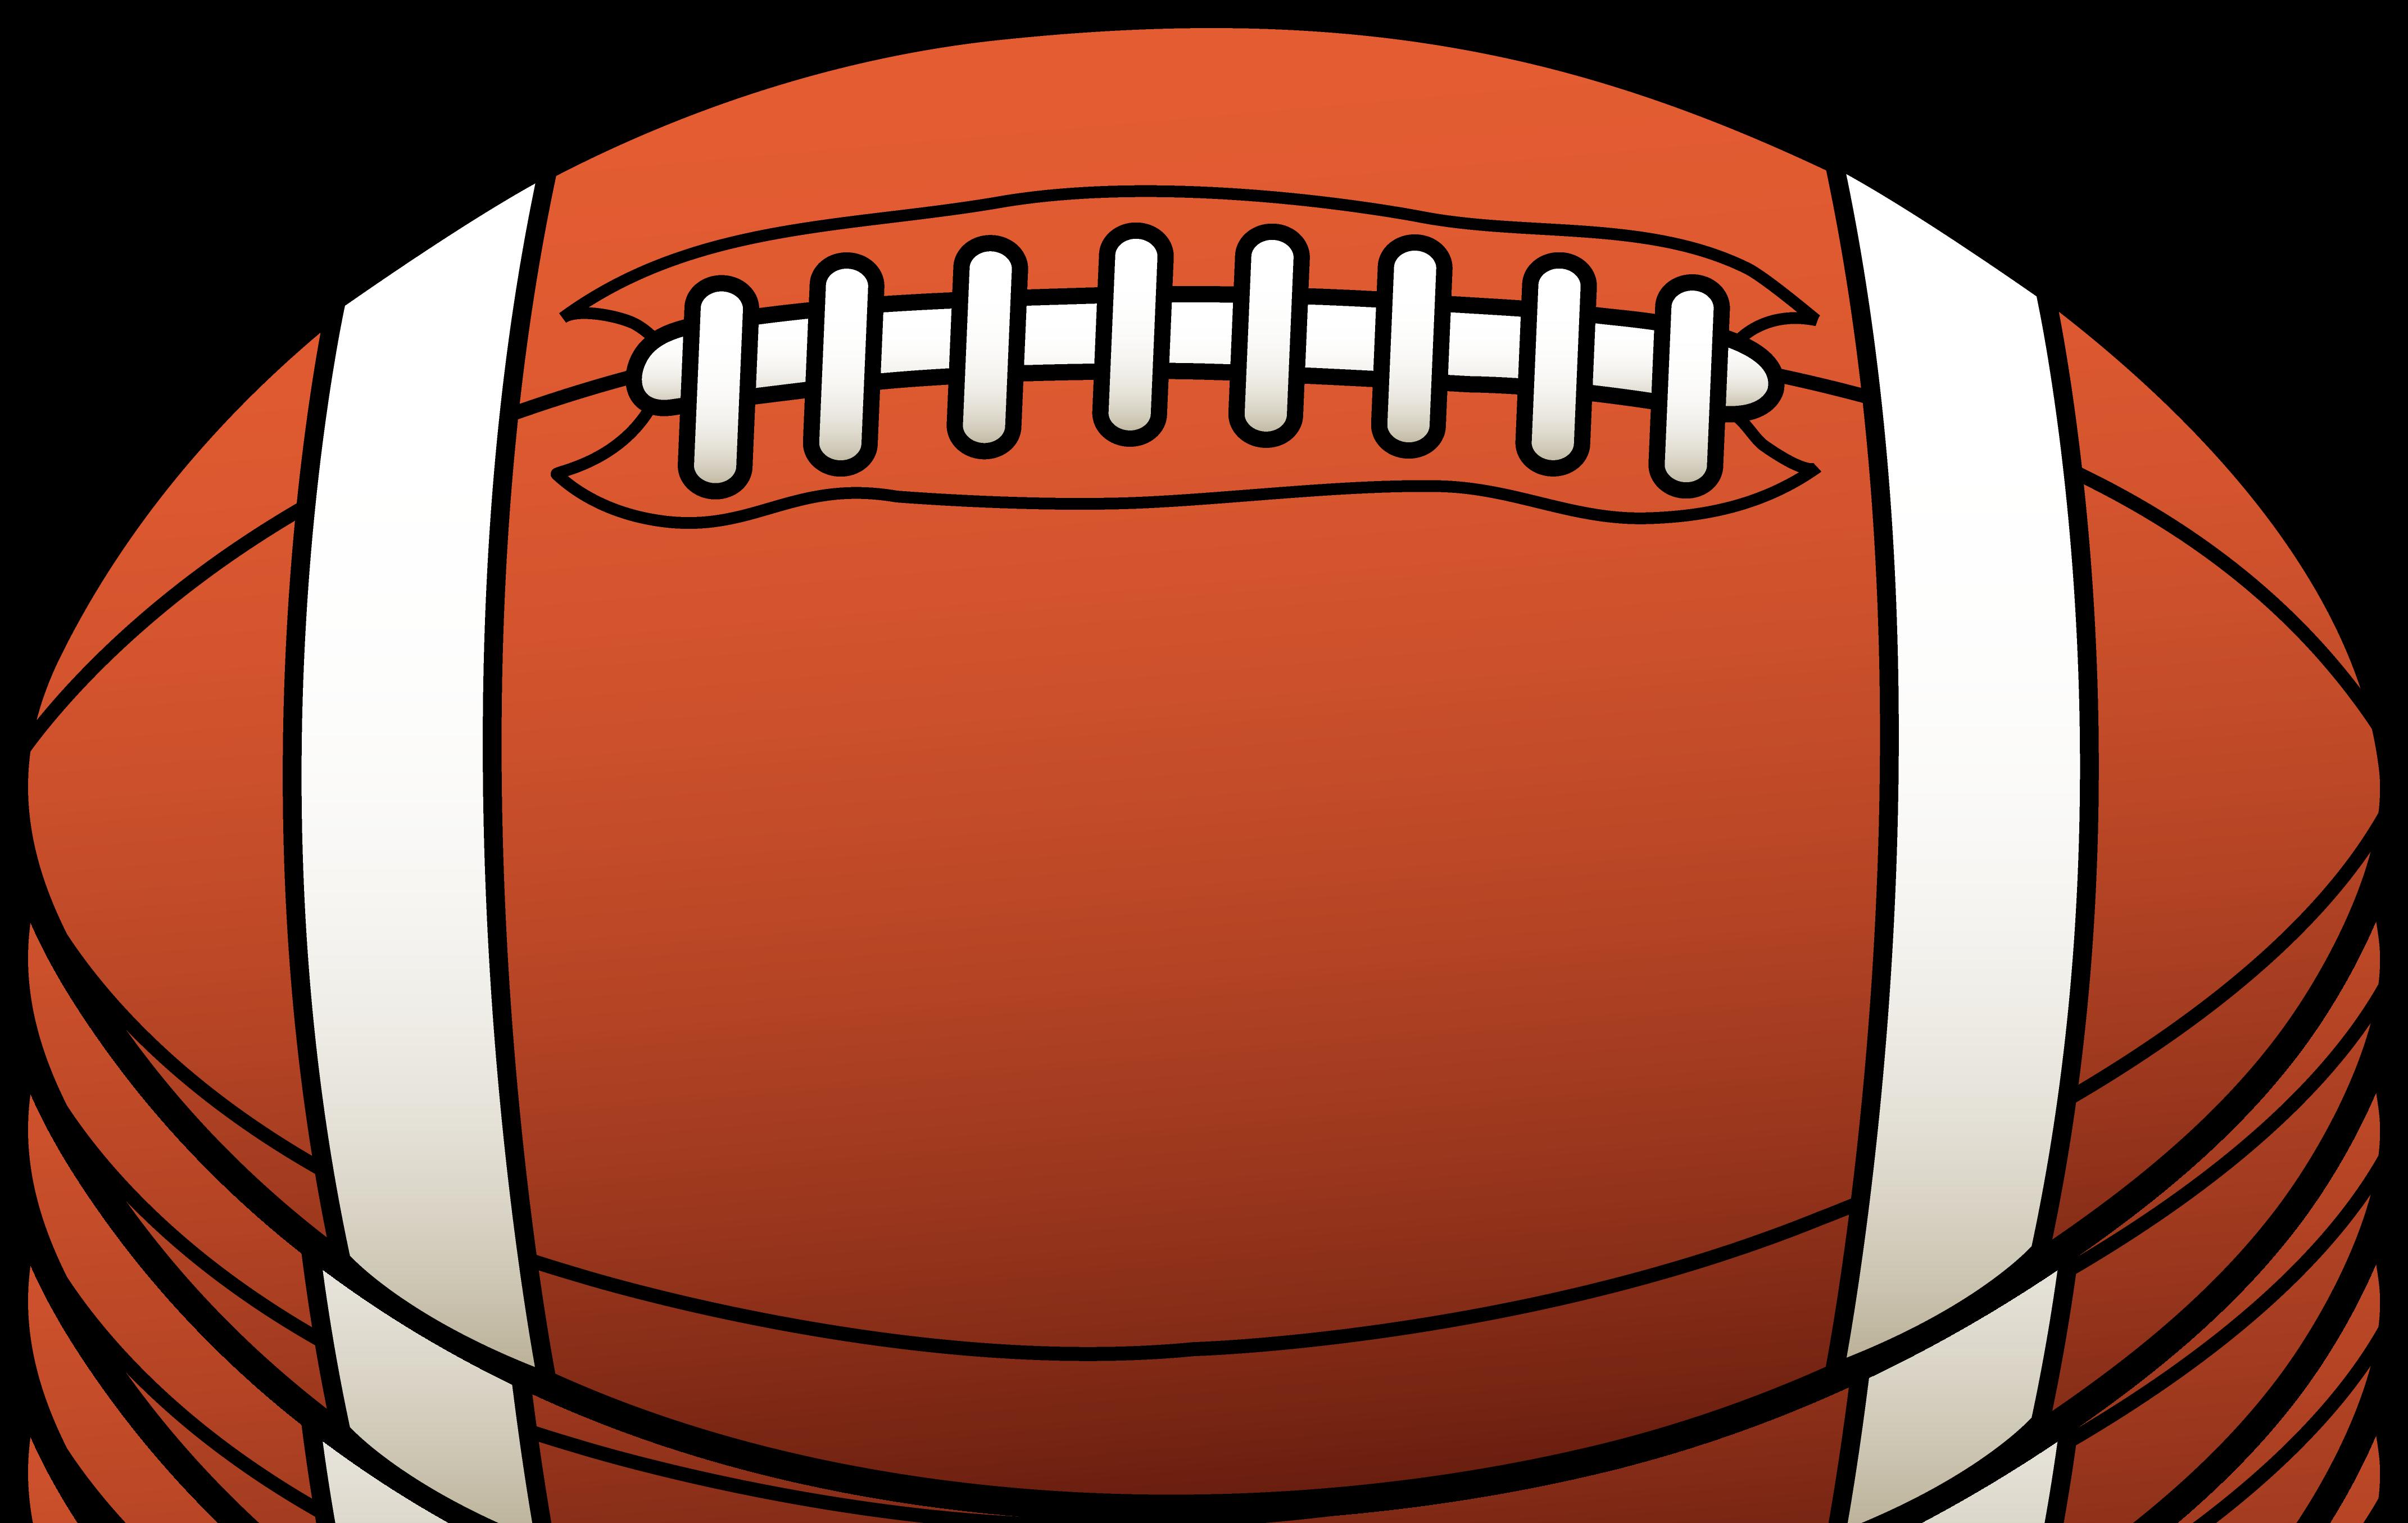 animated clip art of football - photo #14